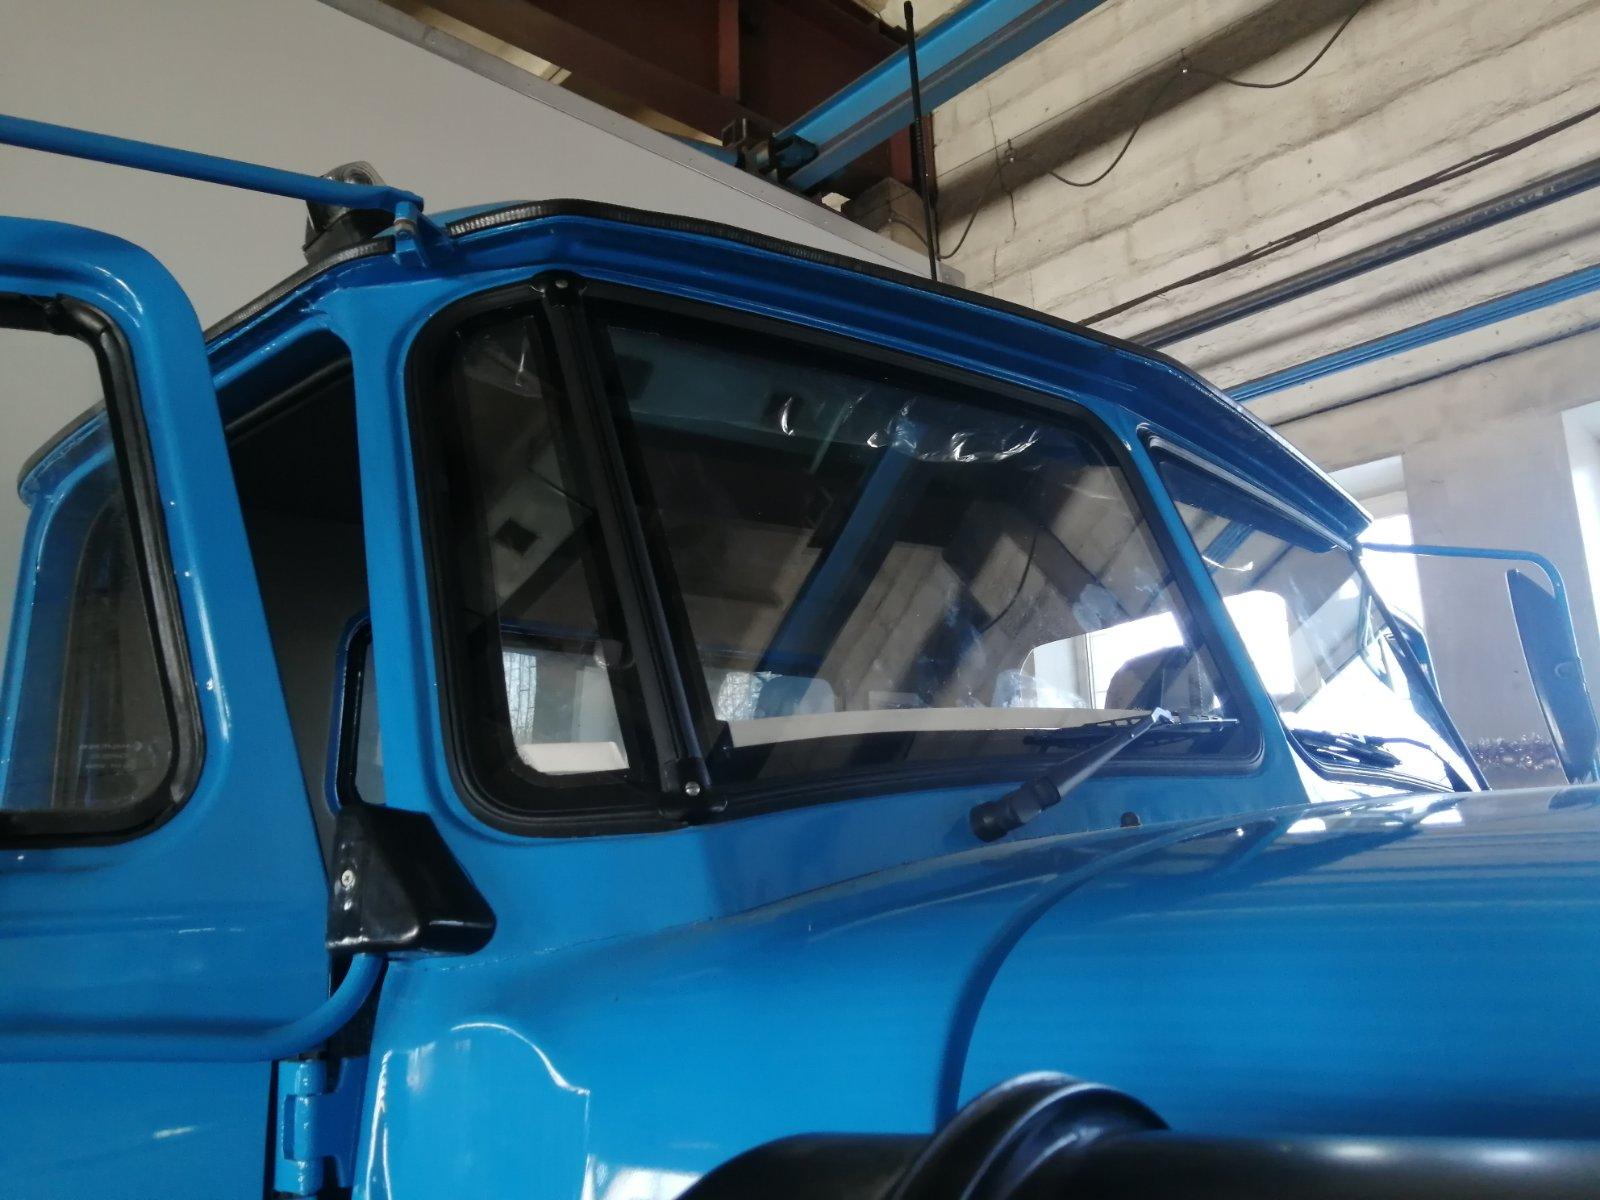 Установка двойного стеклопакета на Урал